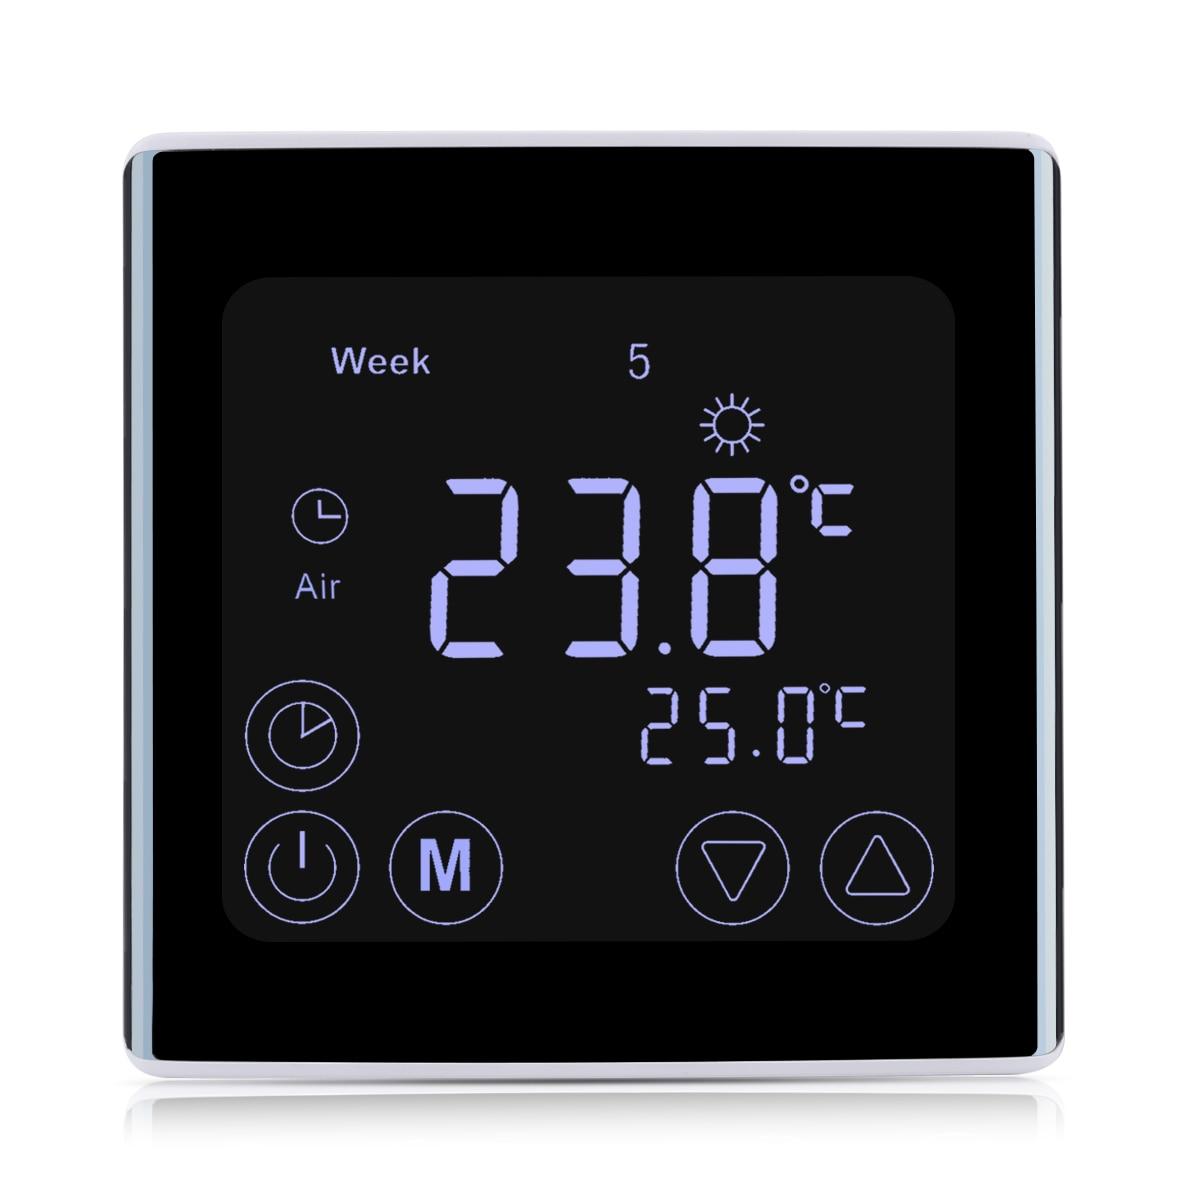 New Weekly Radiante Sala de Aquecimento Termostato Casa Inteligente da Tela de Toque LCD Controlador de Temperatura Termostato LED Backlight Branco